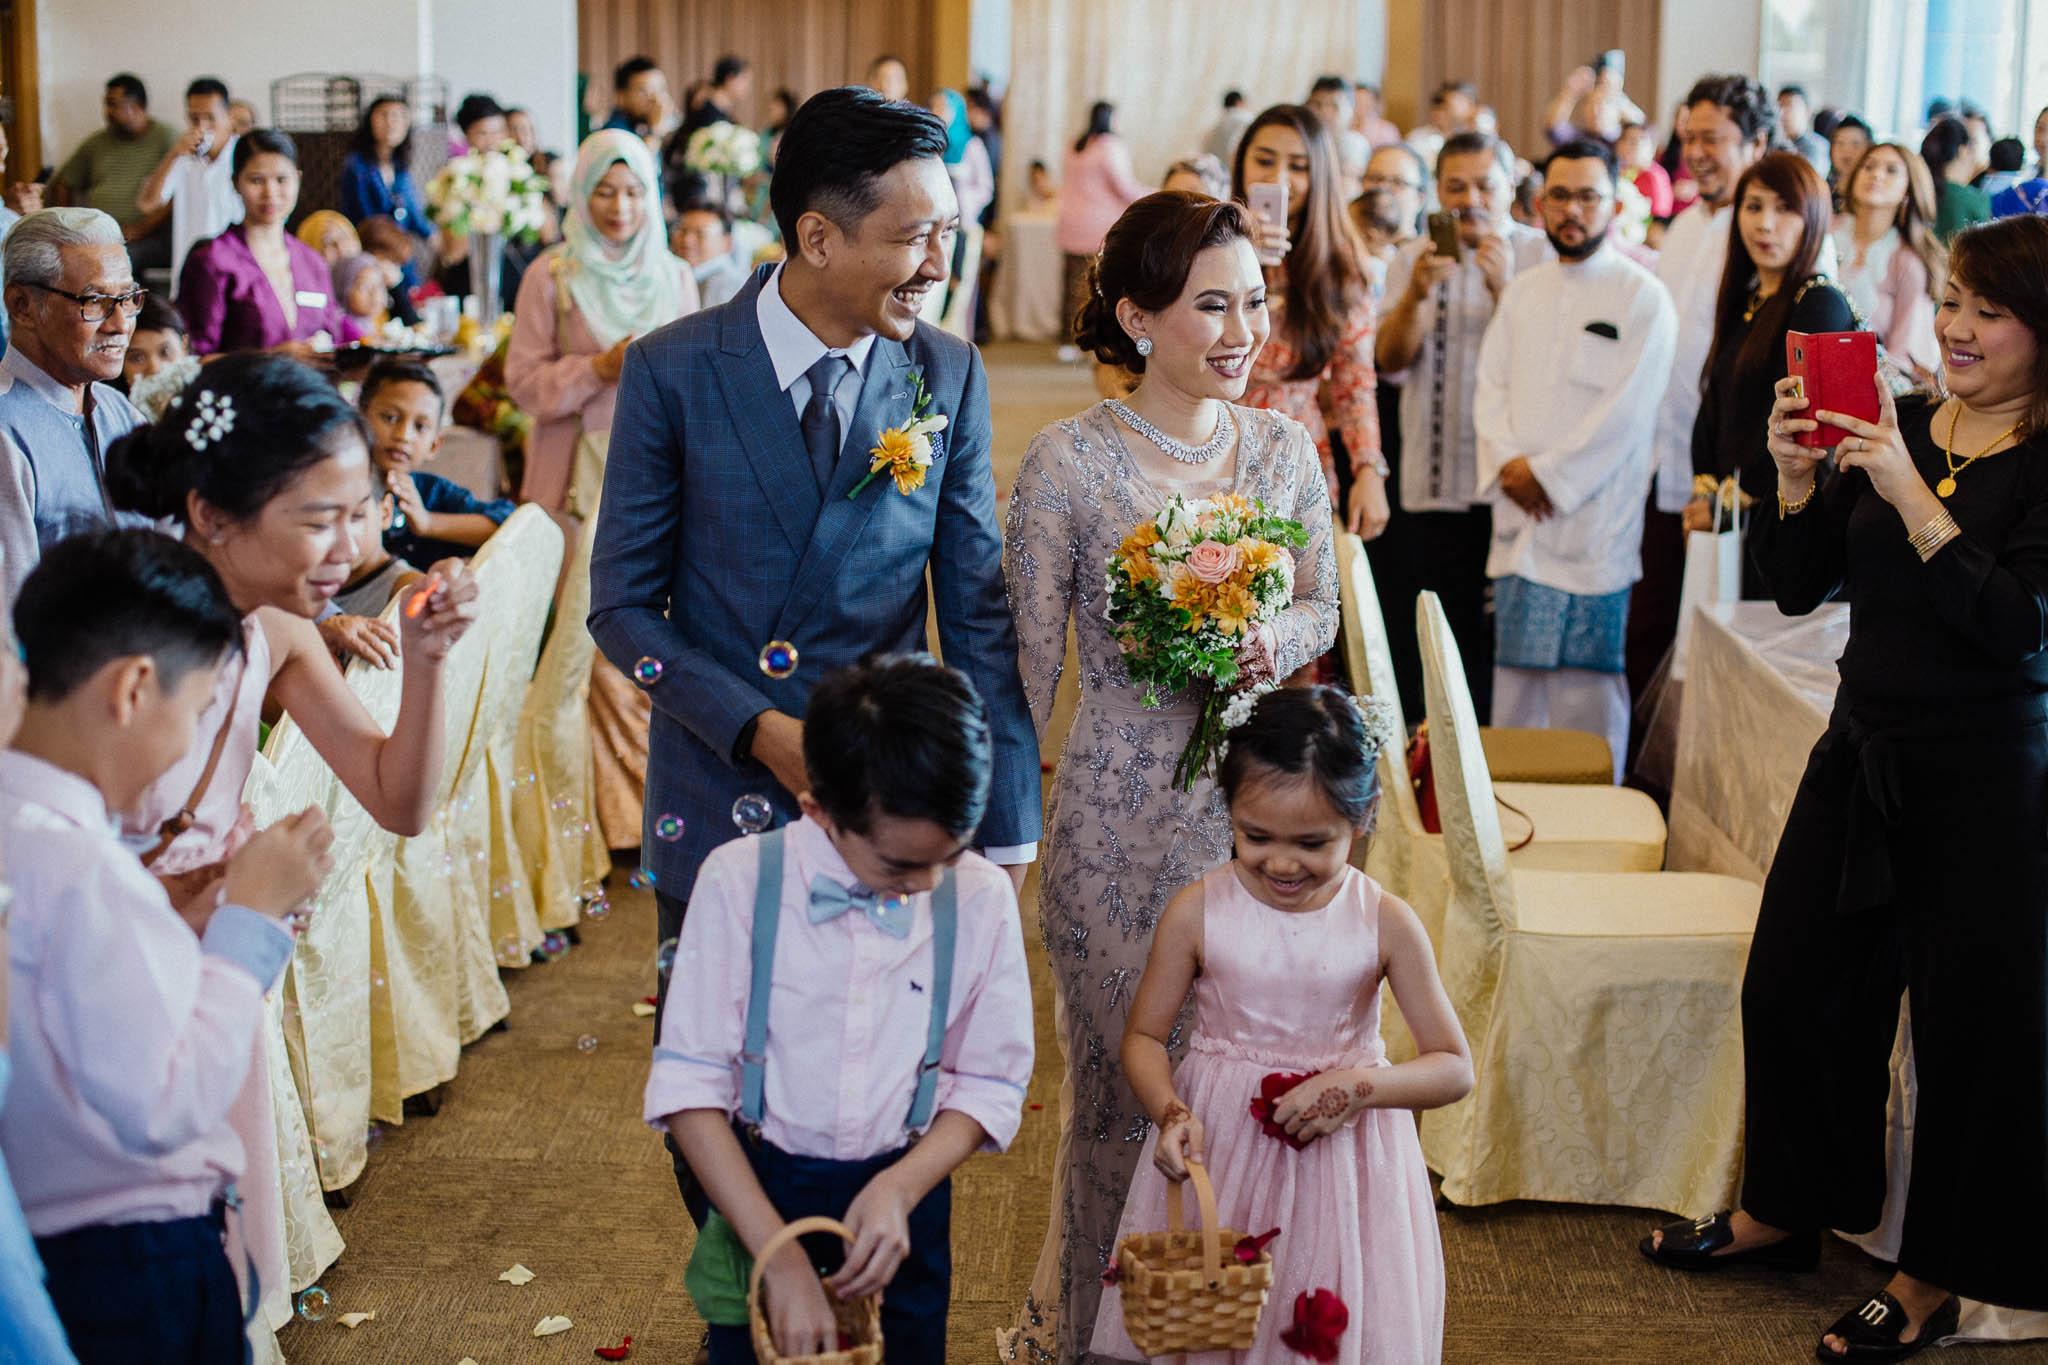 singapore-wedding-photographer-addafiq-nufail-051.jpg